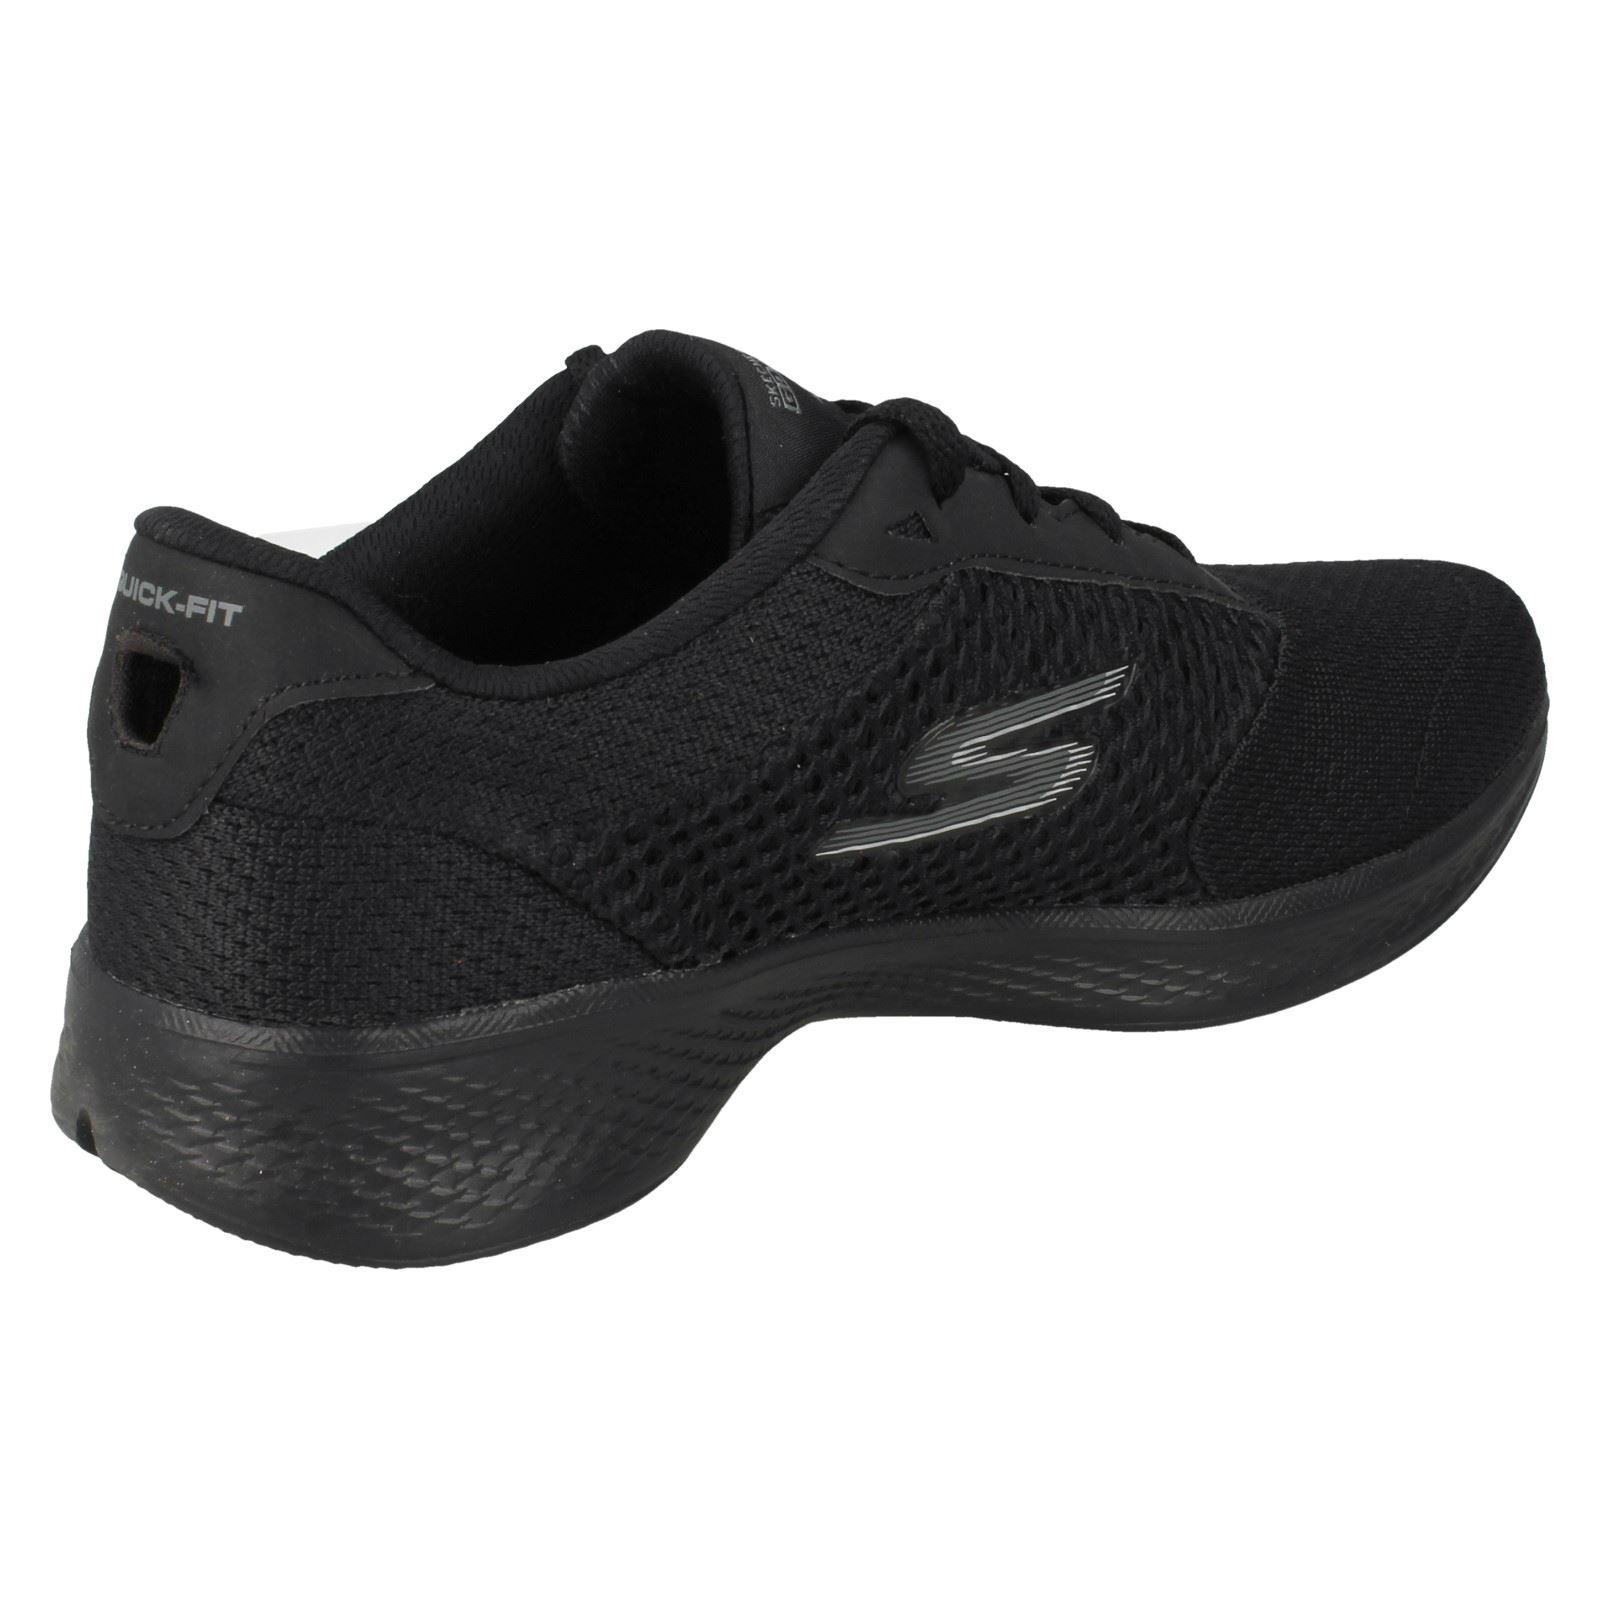 Donna Skechers's Sports Scarpe Da Ginnastica Go Go Go Walk 4 superare i 14146 - b4c5df